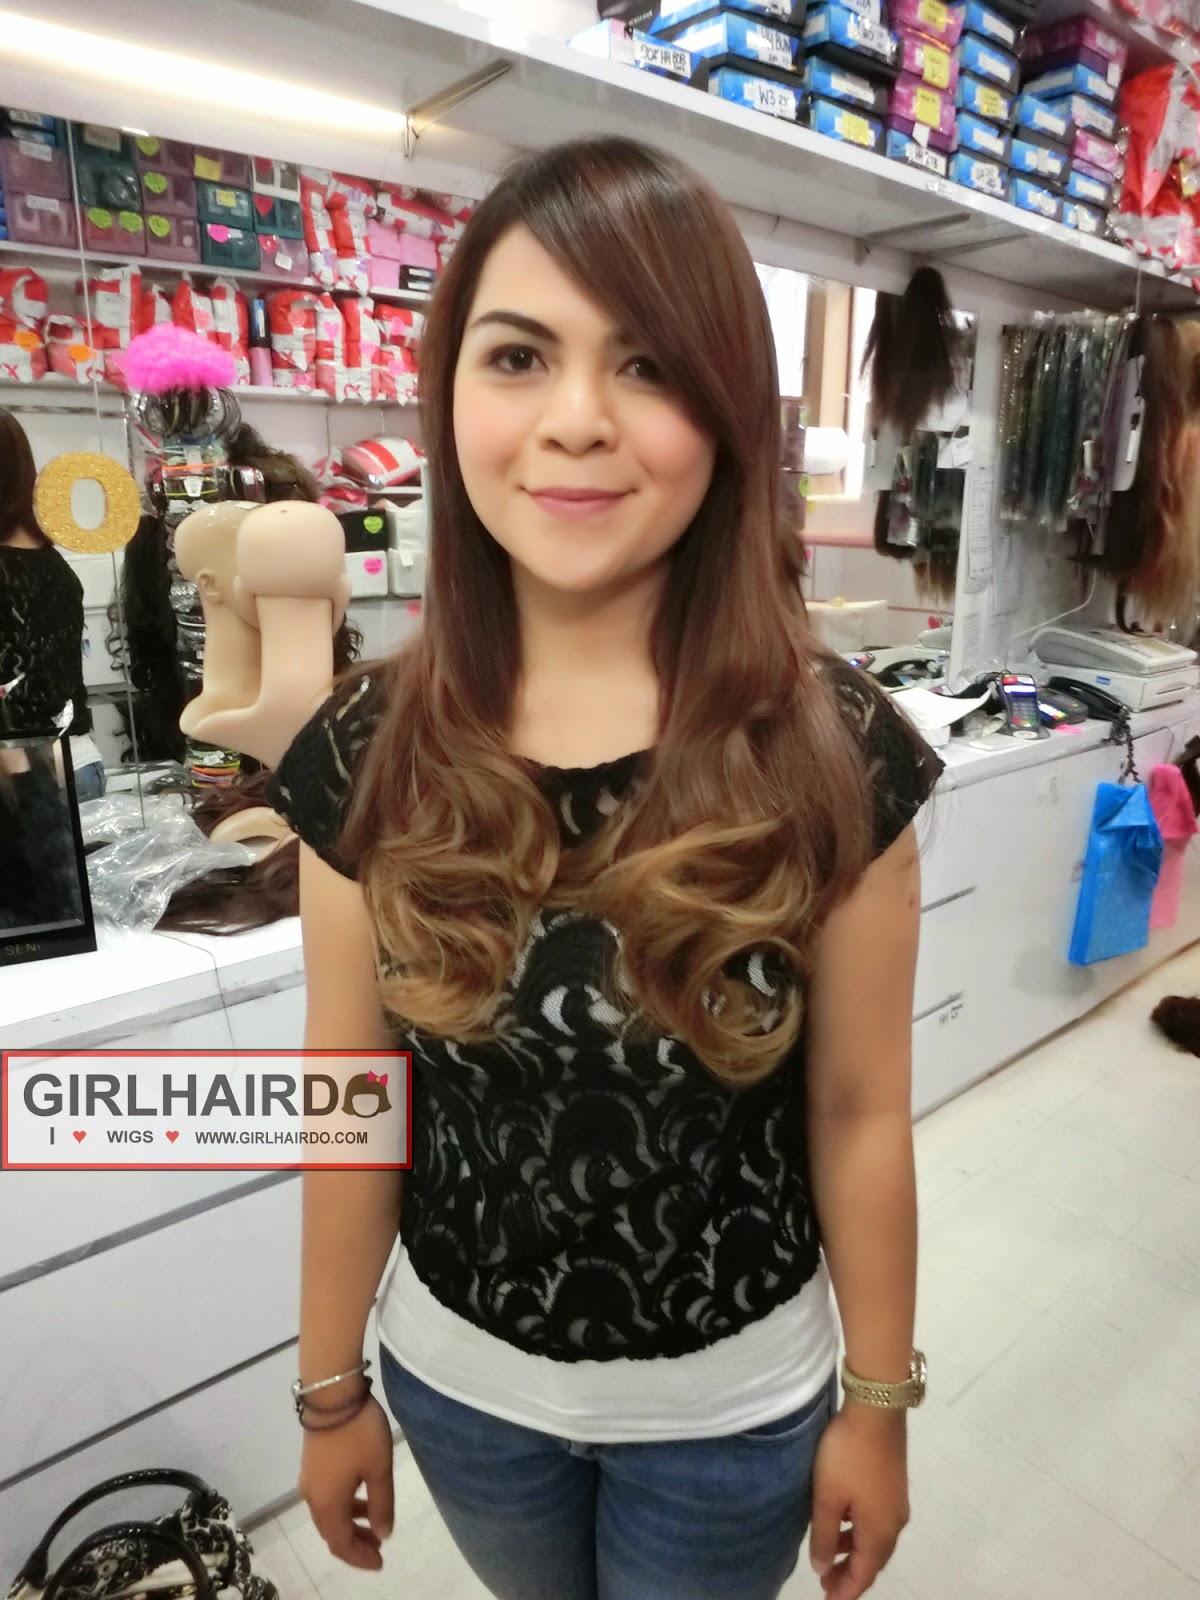 http://4.bp.blogspot.com/-revSOn5fkWw/U94ve9Tov8I/AAAAAAAATKc/qWgXjJWcCQo/s1600/girlhairdo+customer+hair+CIMG1790.JPG